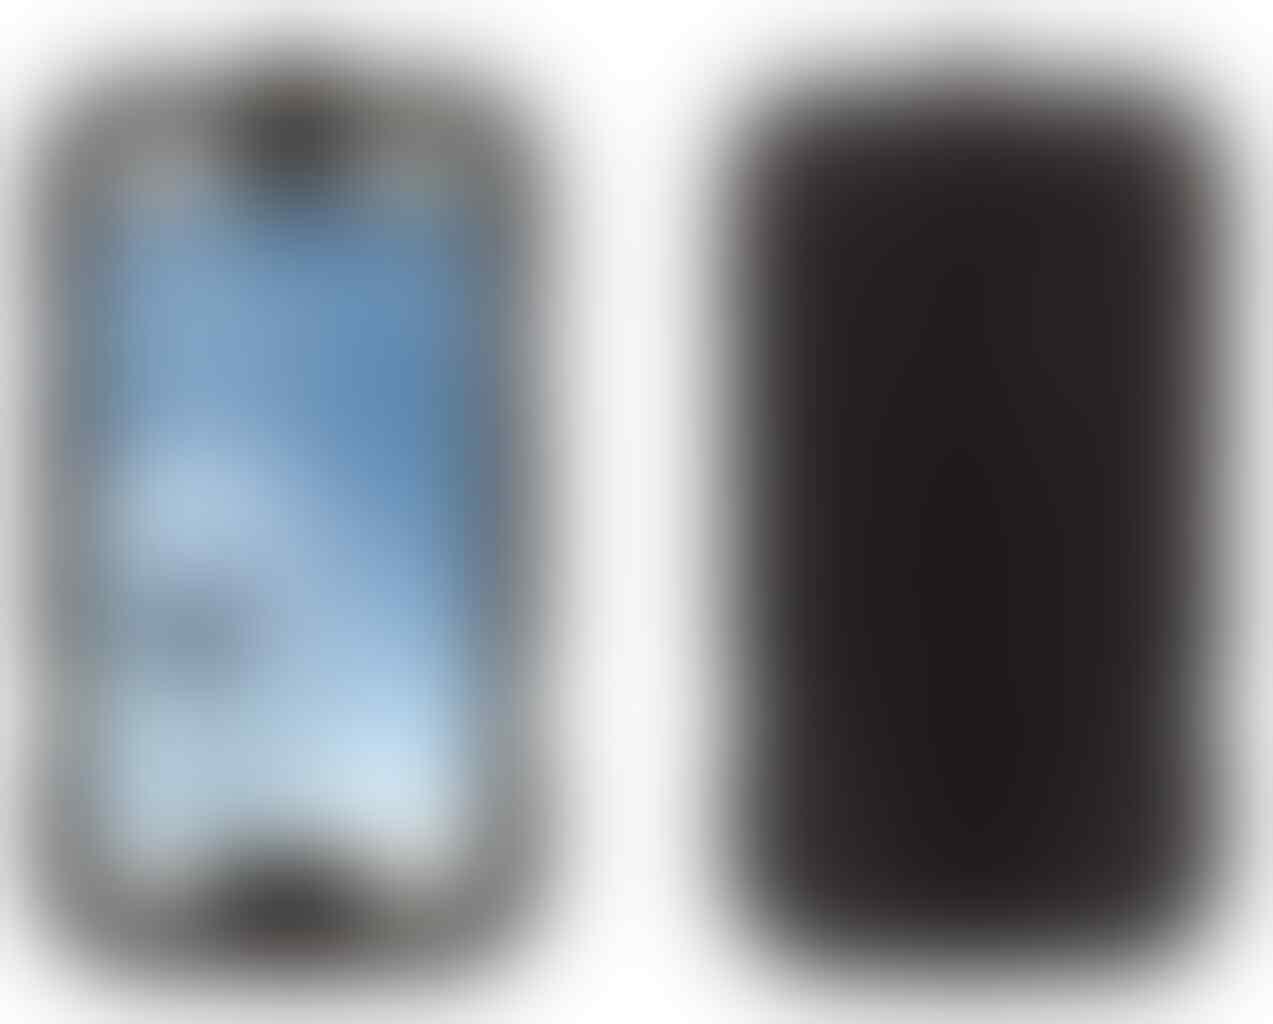 Accesories Iphone&Samsung Elementcase,otterbox,solace,ronin,blackops,puregear,Lunatik